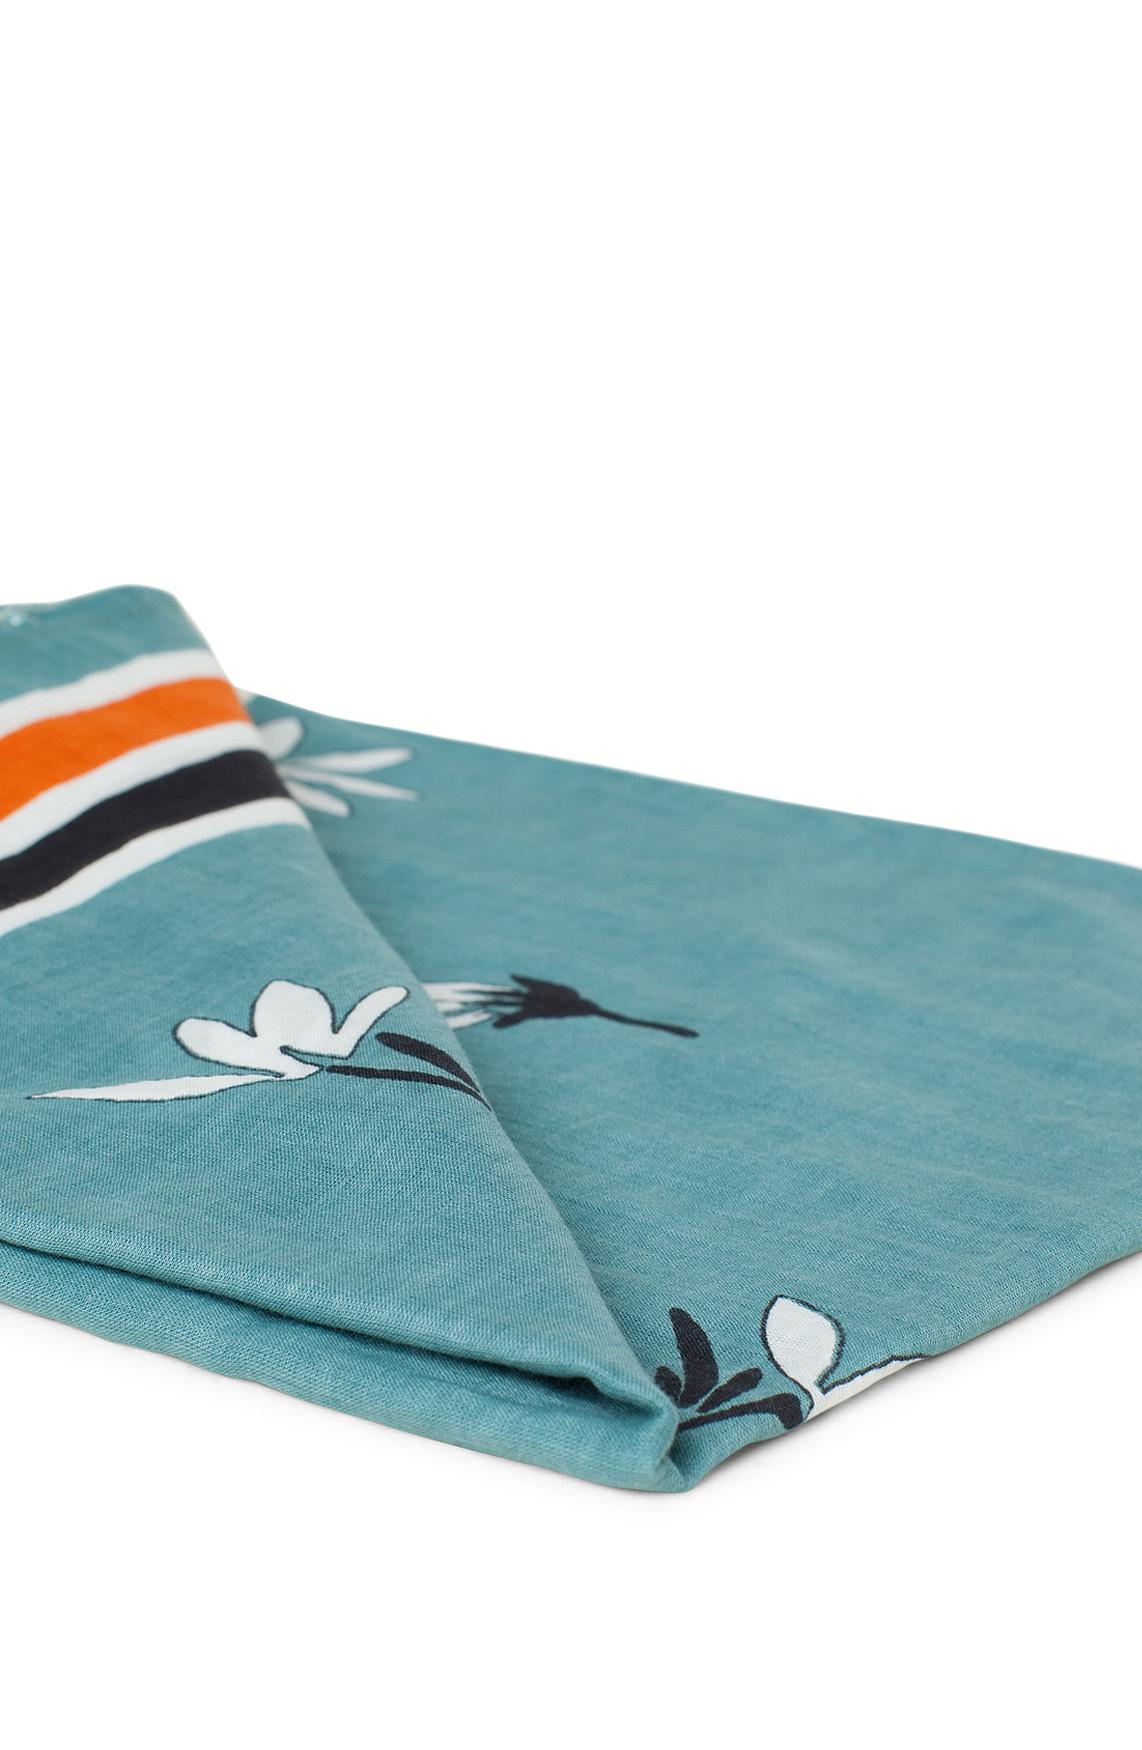 Anna Dames Geprinte shawl met kwastjes groen